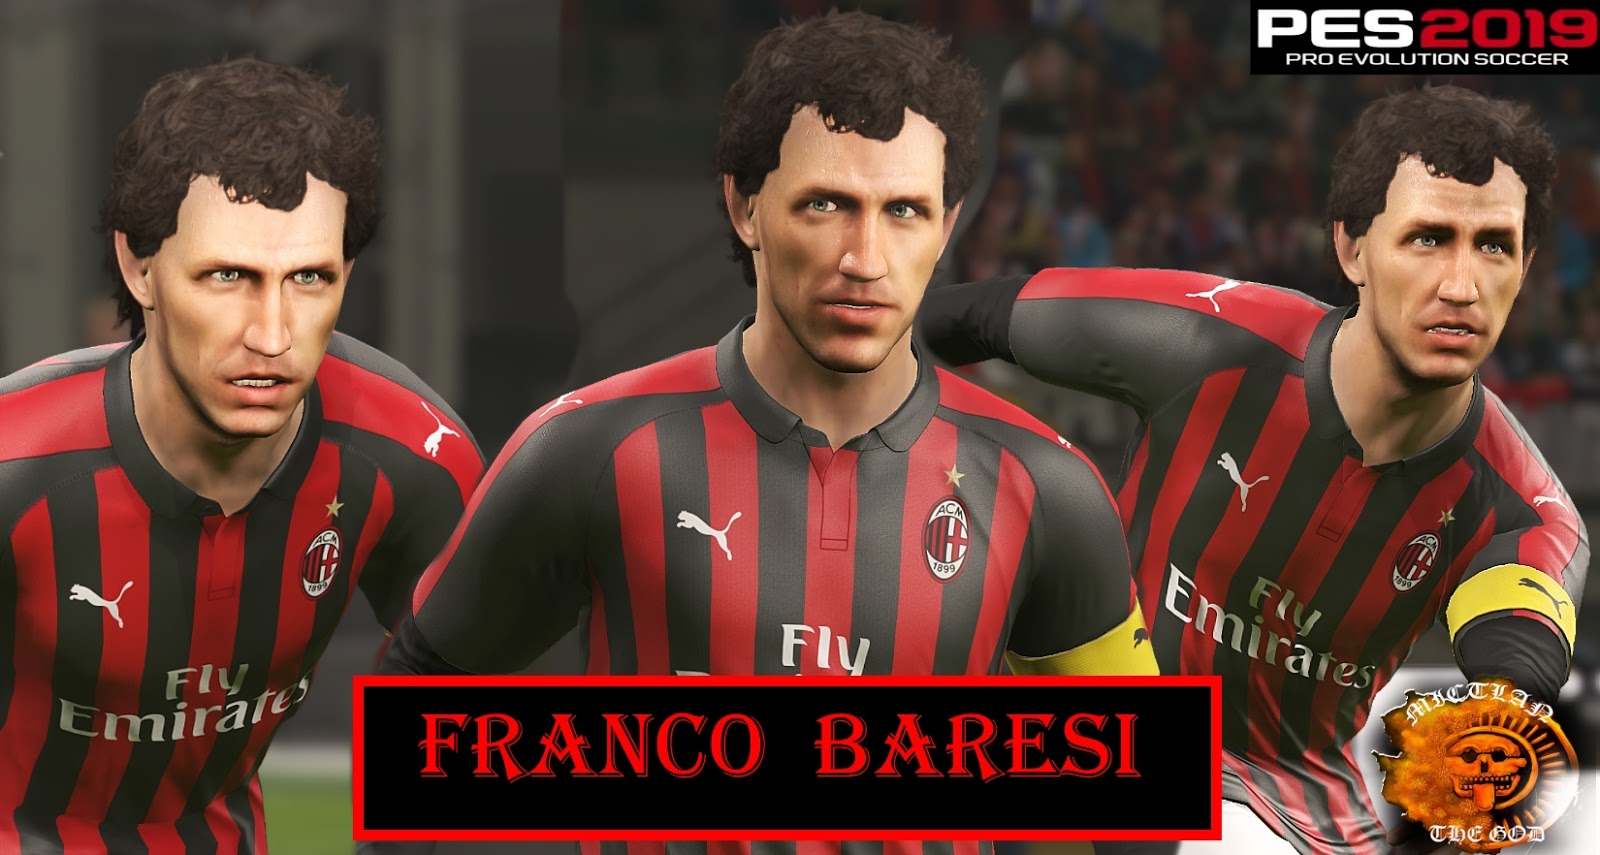 PES 2019 Franco Baresi Face by MictlanTheGod